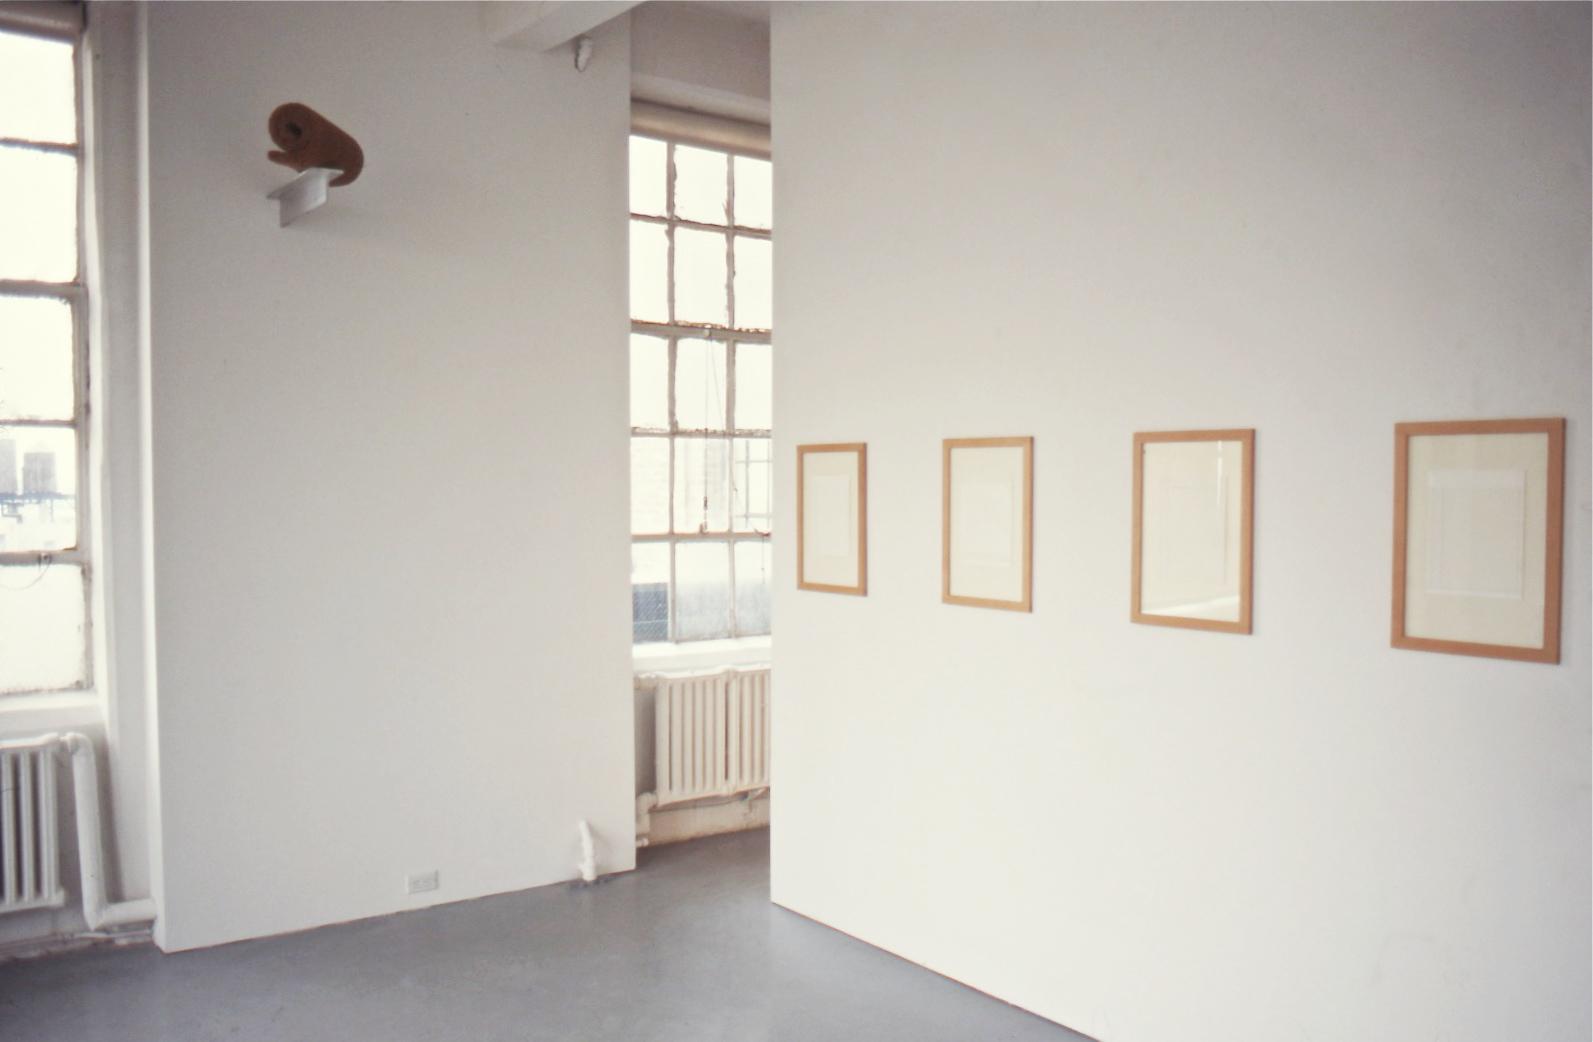 Serge Spitzer at Lawrence Markey 1995 2.jpeg